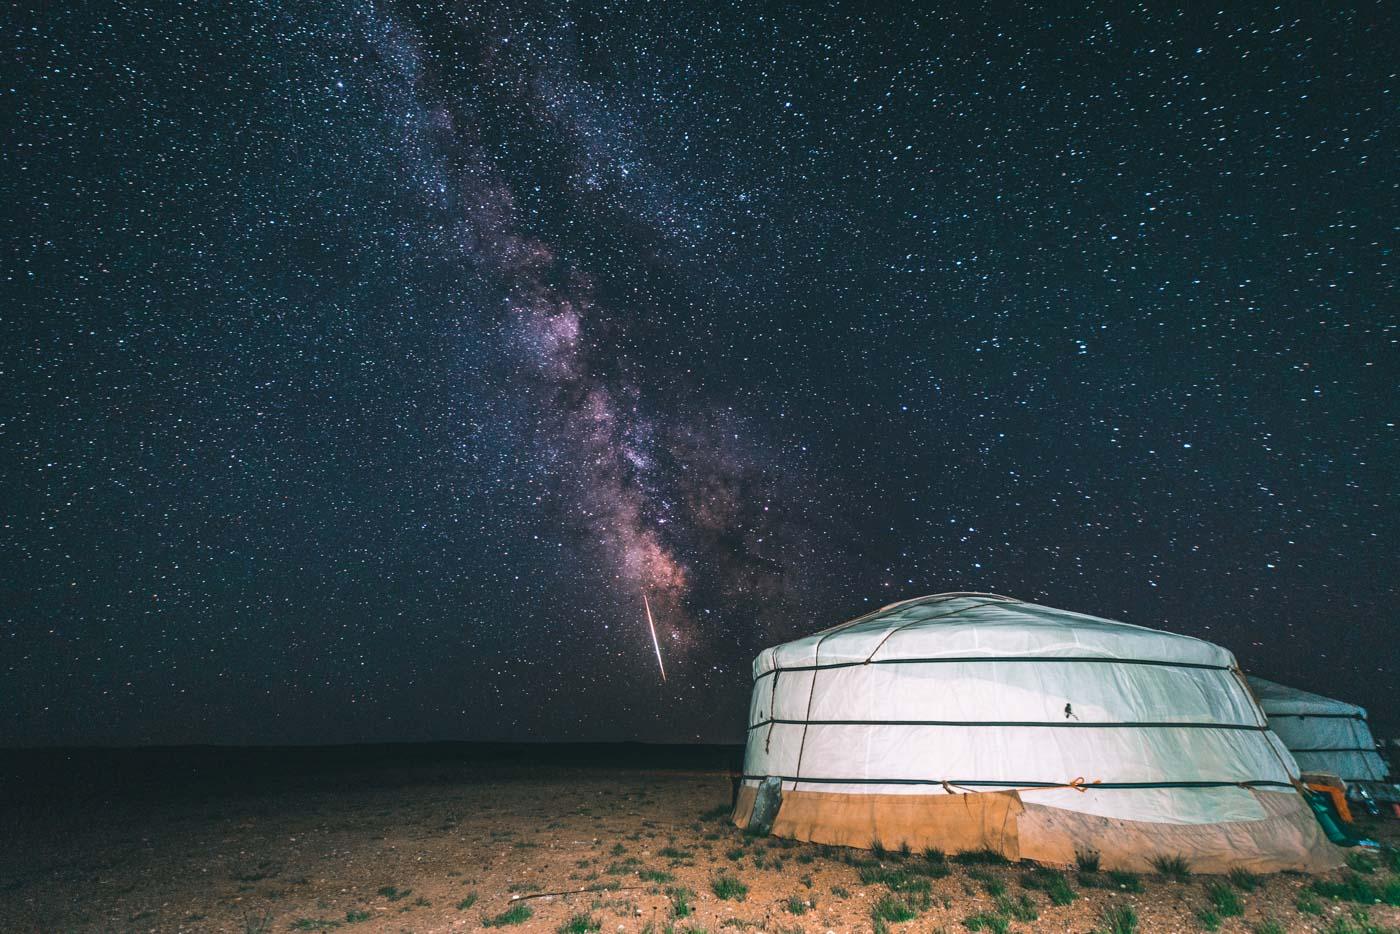 Star gazing in the Gobi Desert was not too shabby either!